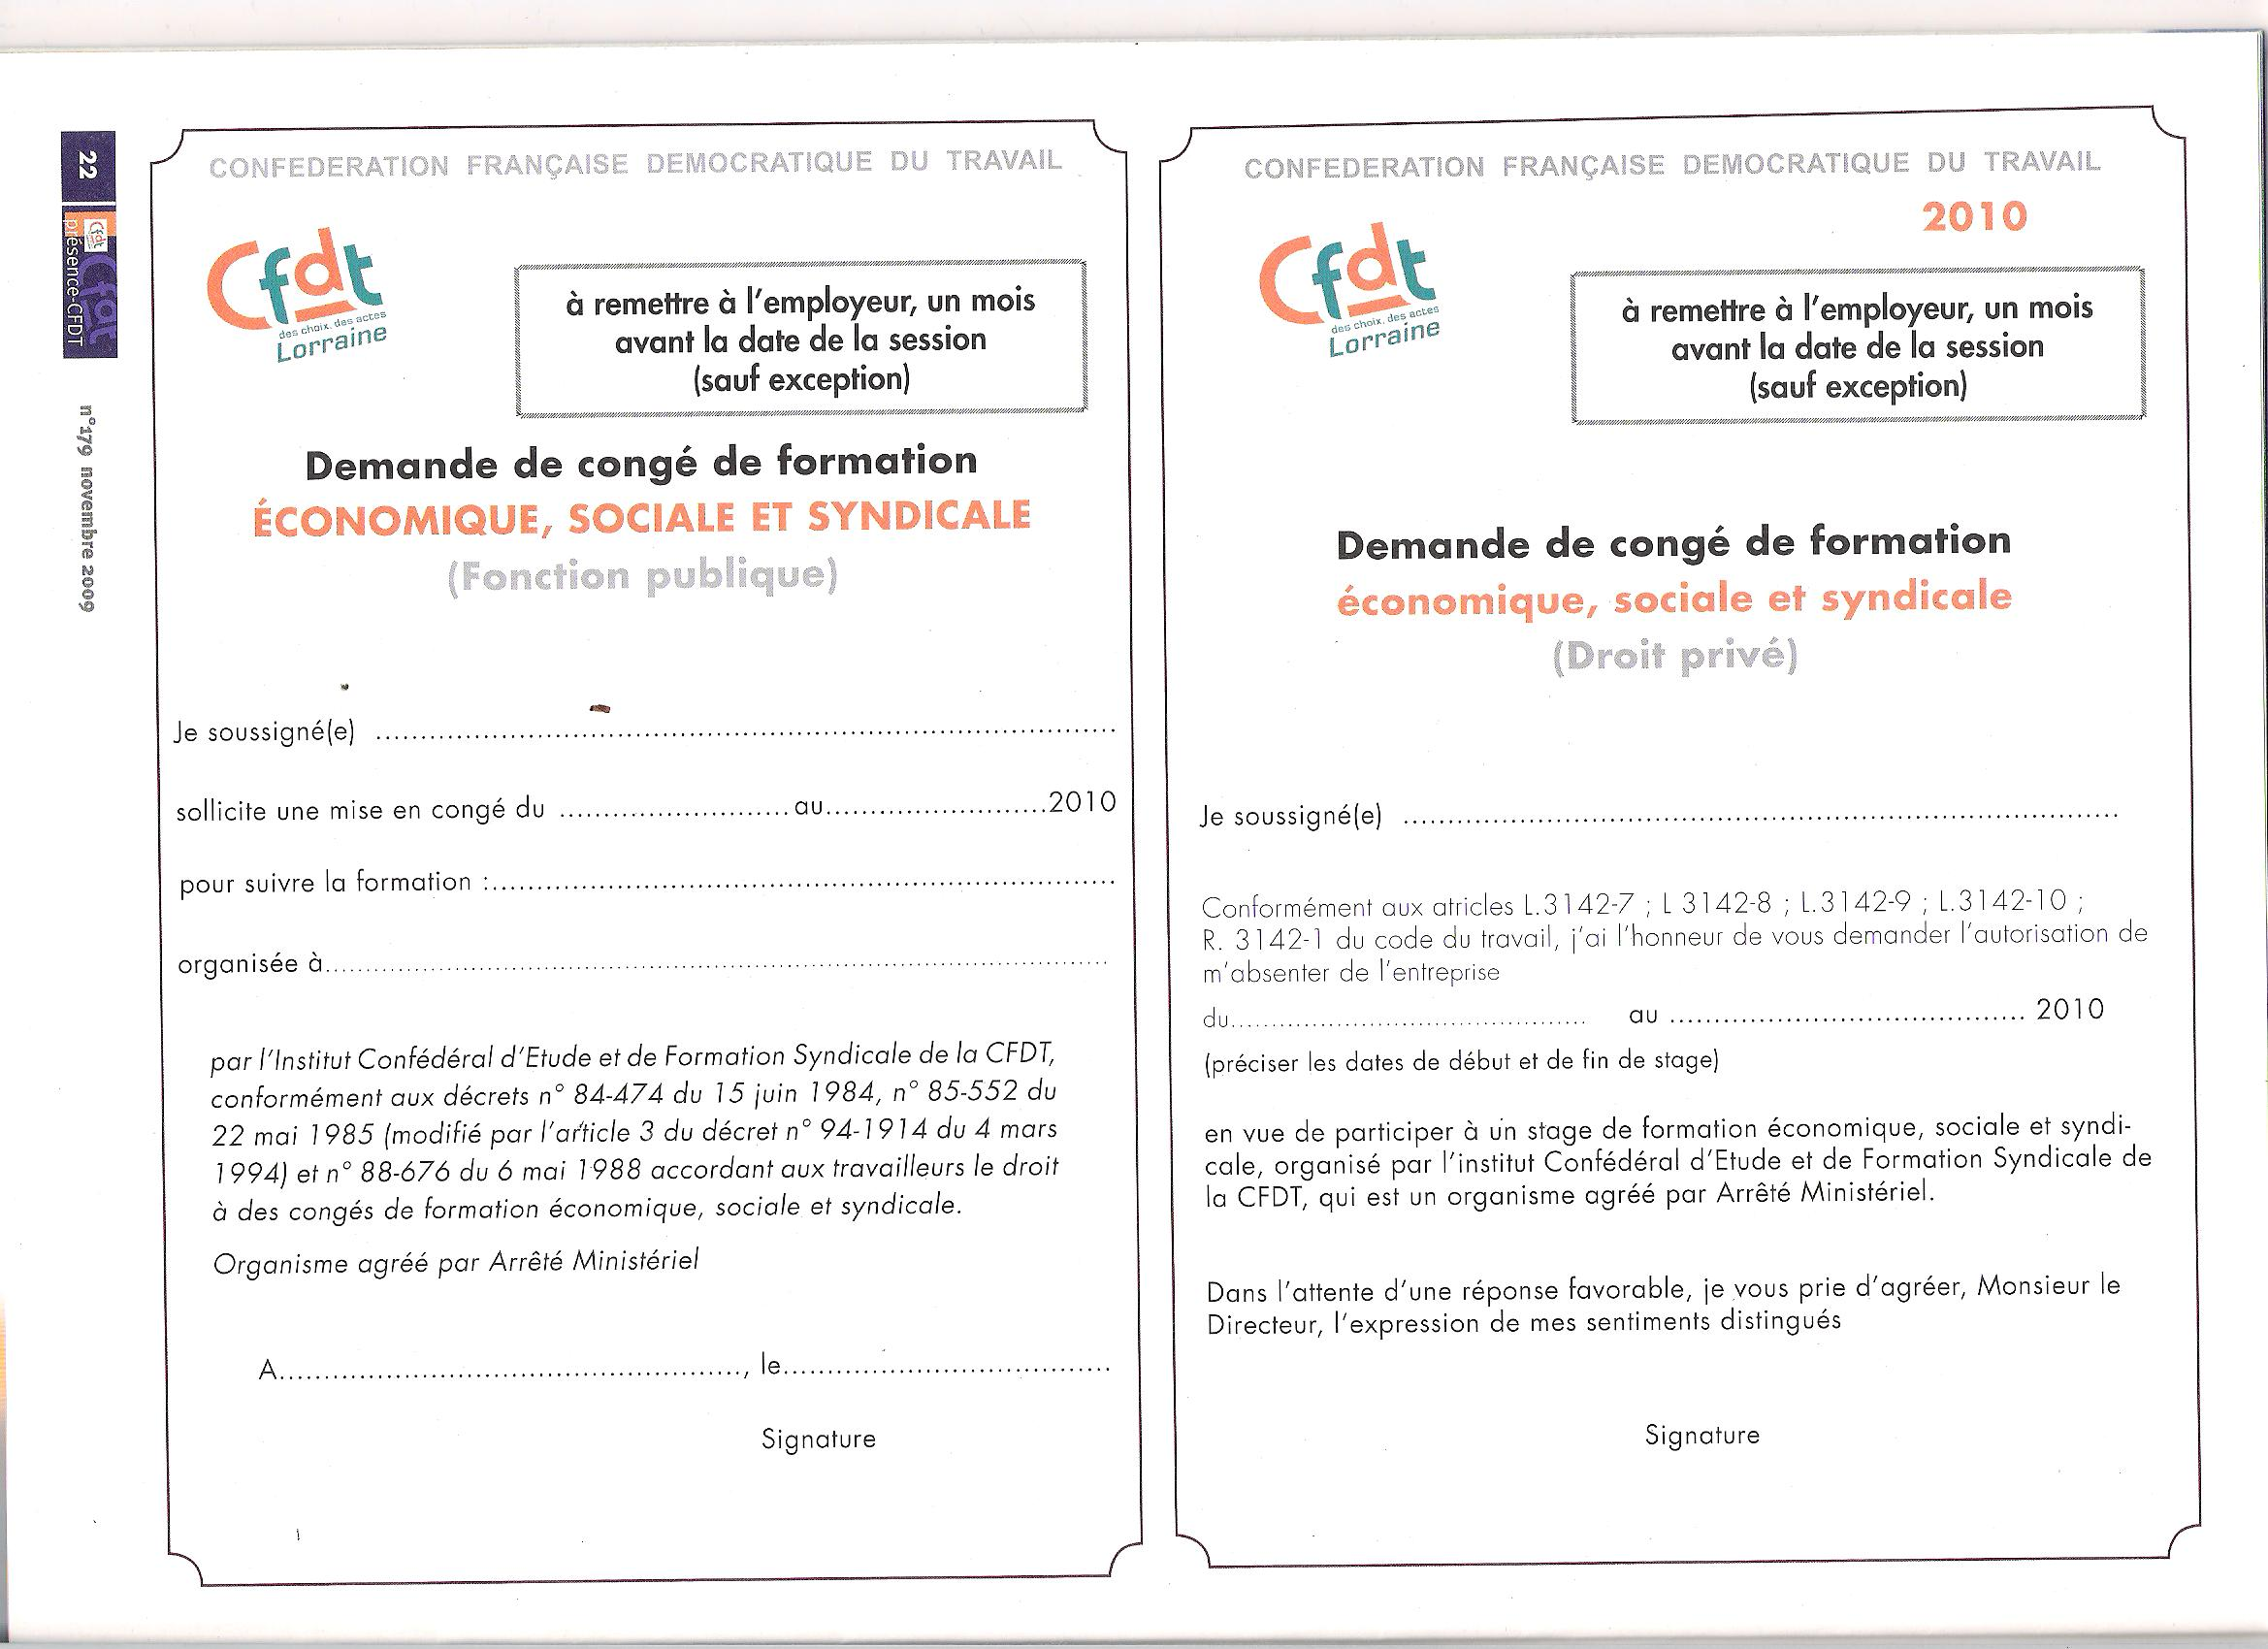 Fiches Inscription Formation Syndicale Cfdt Sante Sociaux Aeim